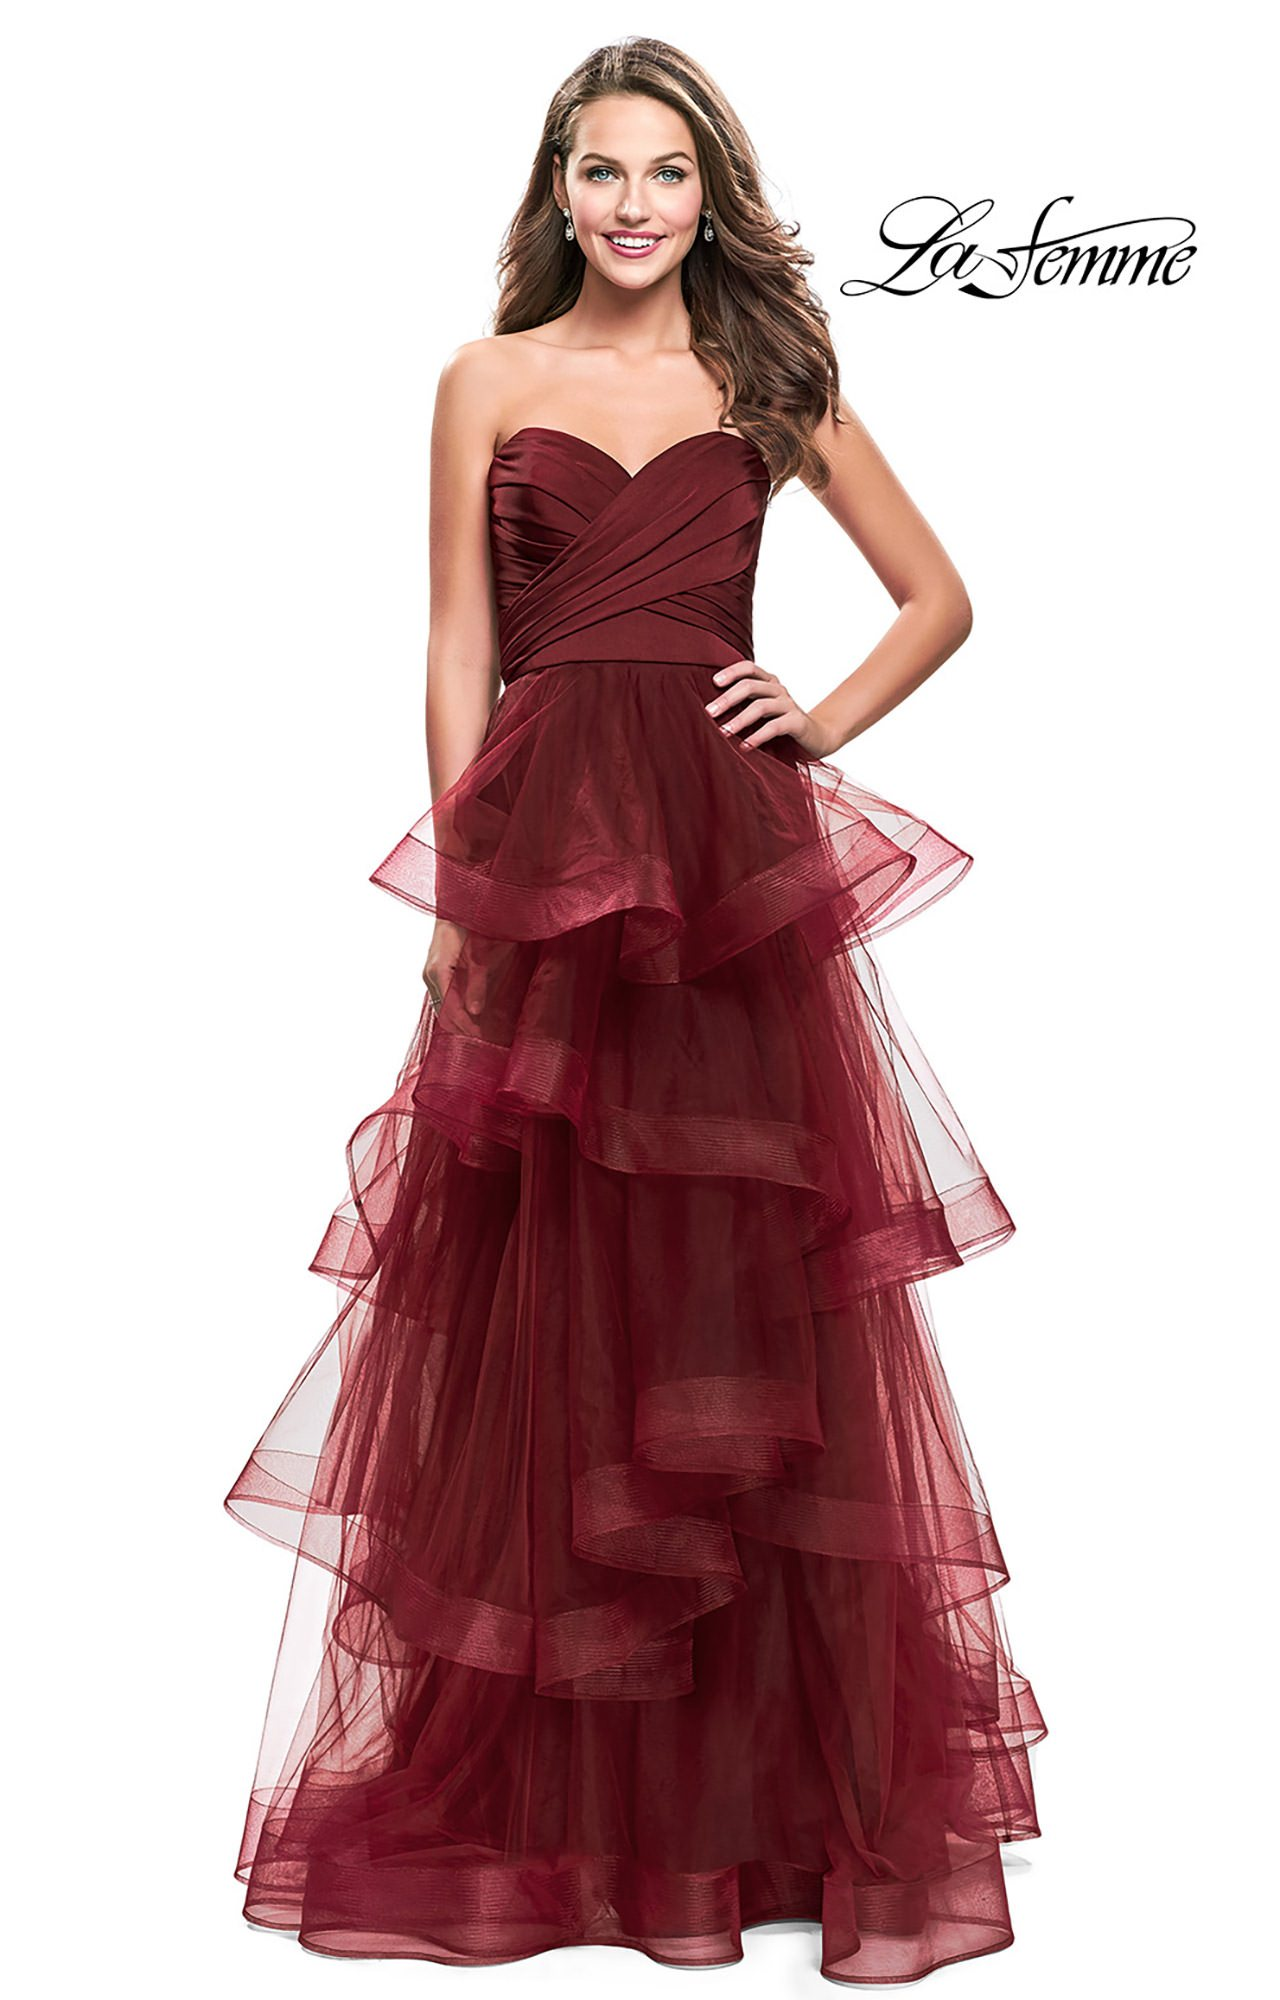 La Femme 25430 - Strapless A-Line Tulle Prom Dress